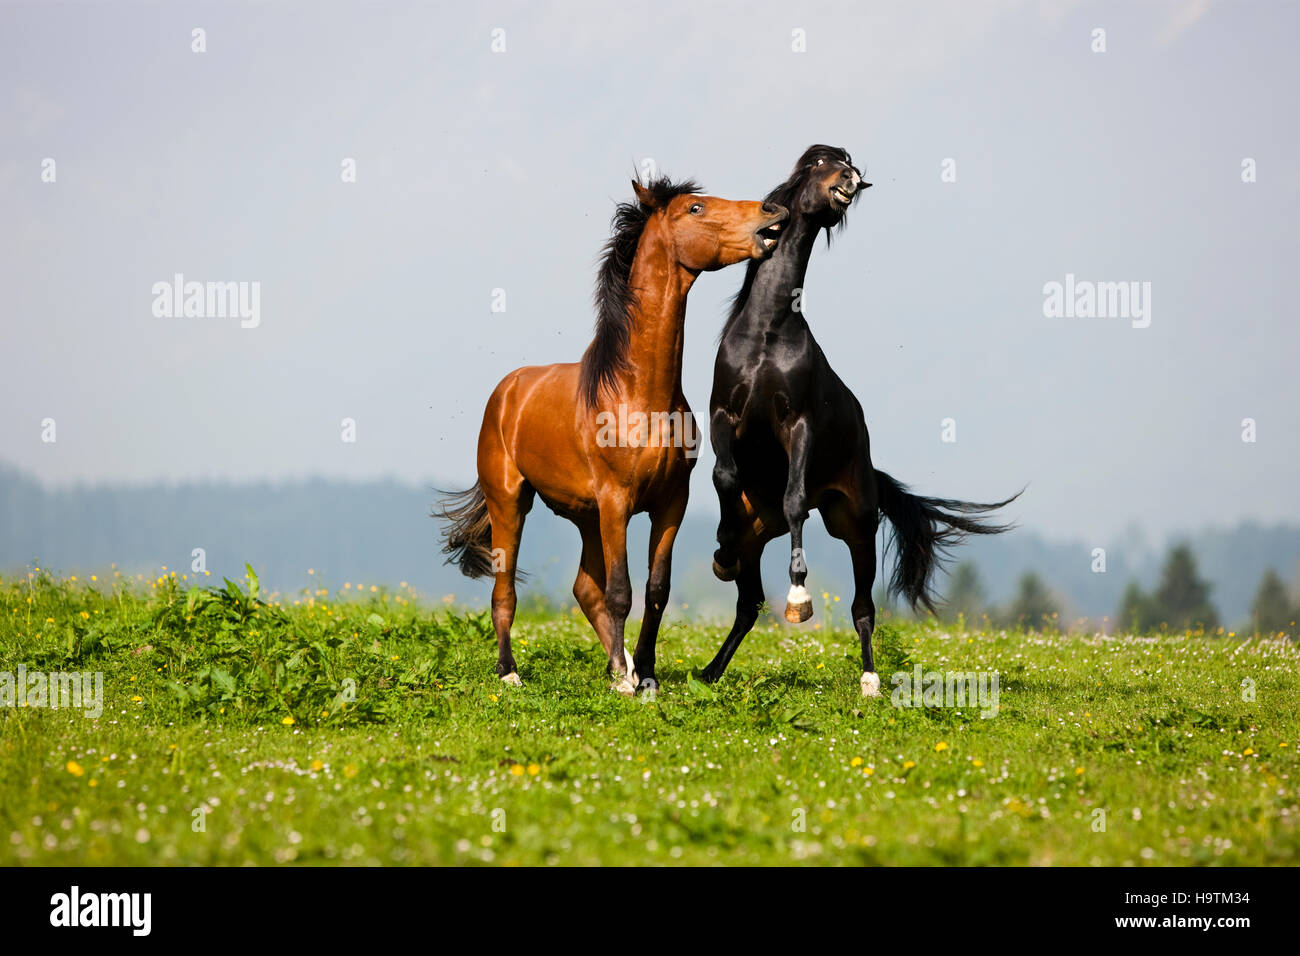 Morgan Stallion and Warmblood Stallion playing, meadow, Austria - Stock Image